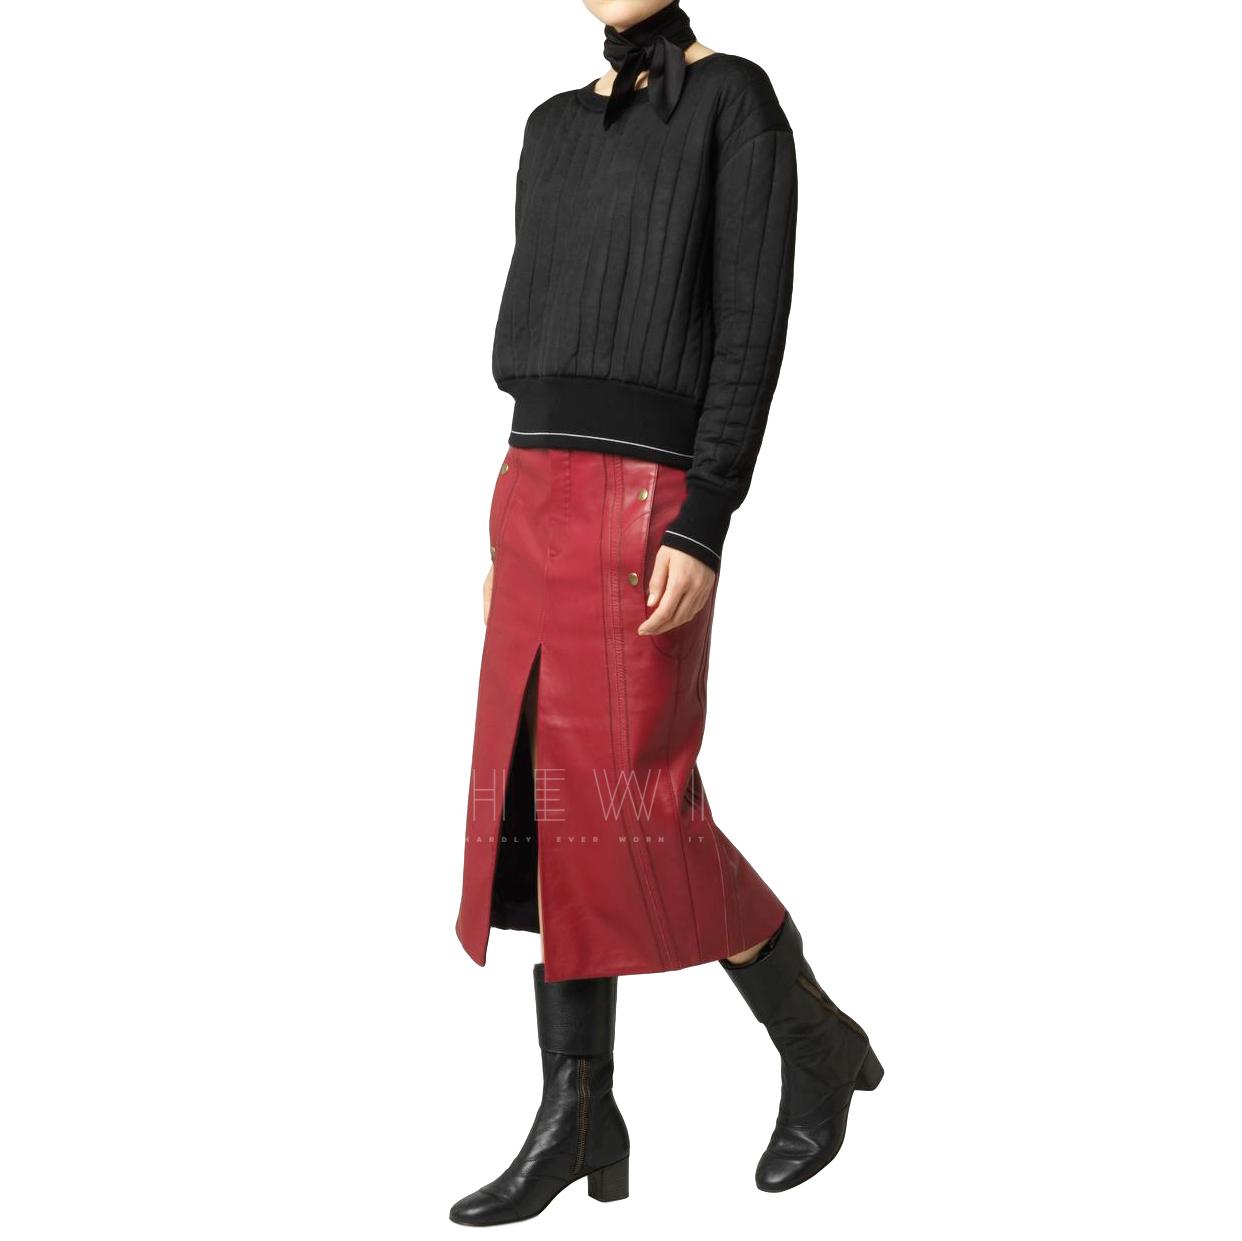 Chloe Leather & Nubuck Biker Skirt With Slit